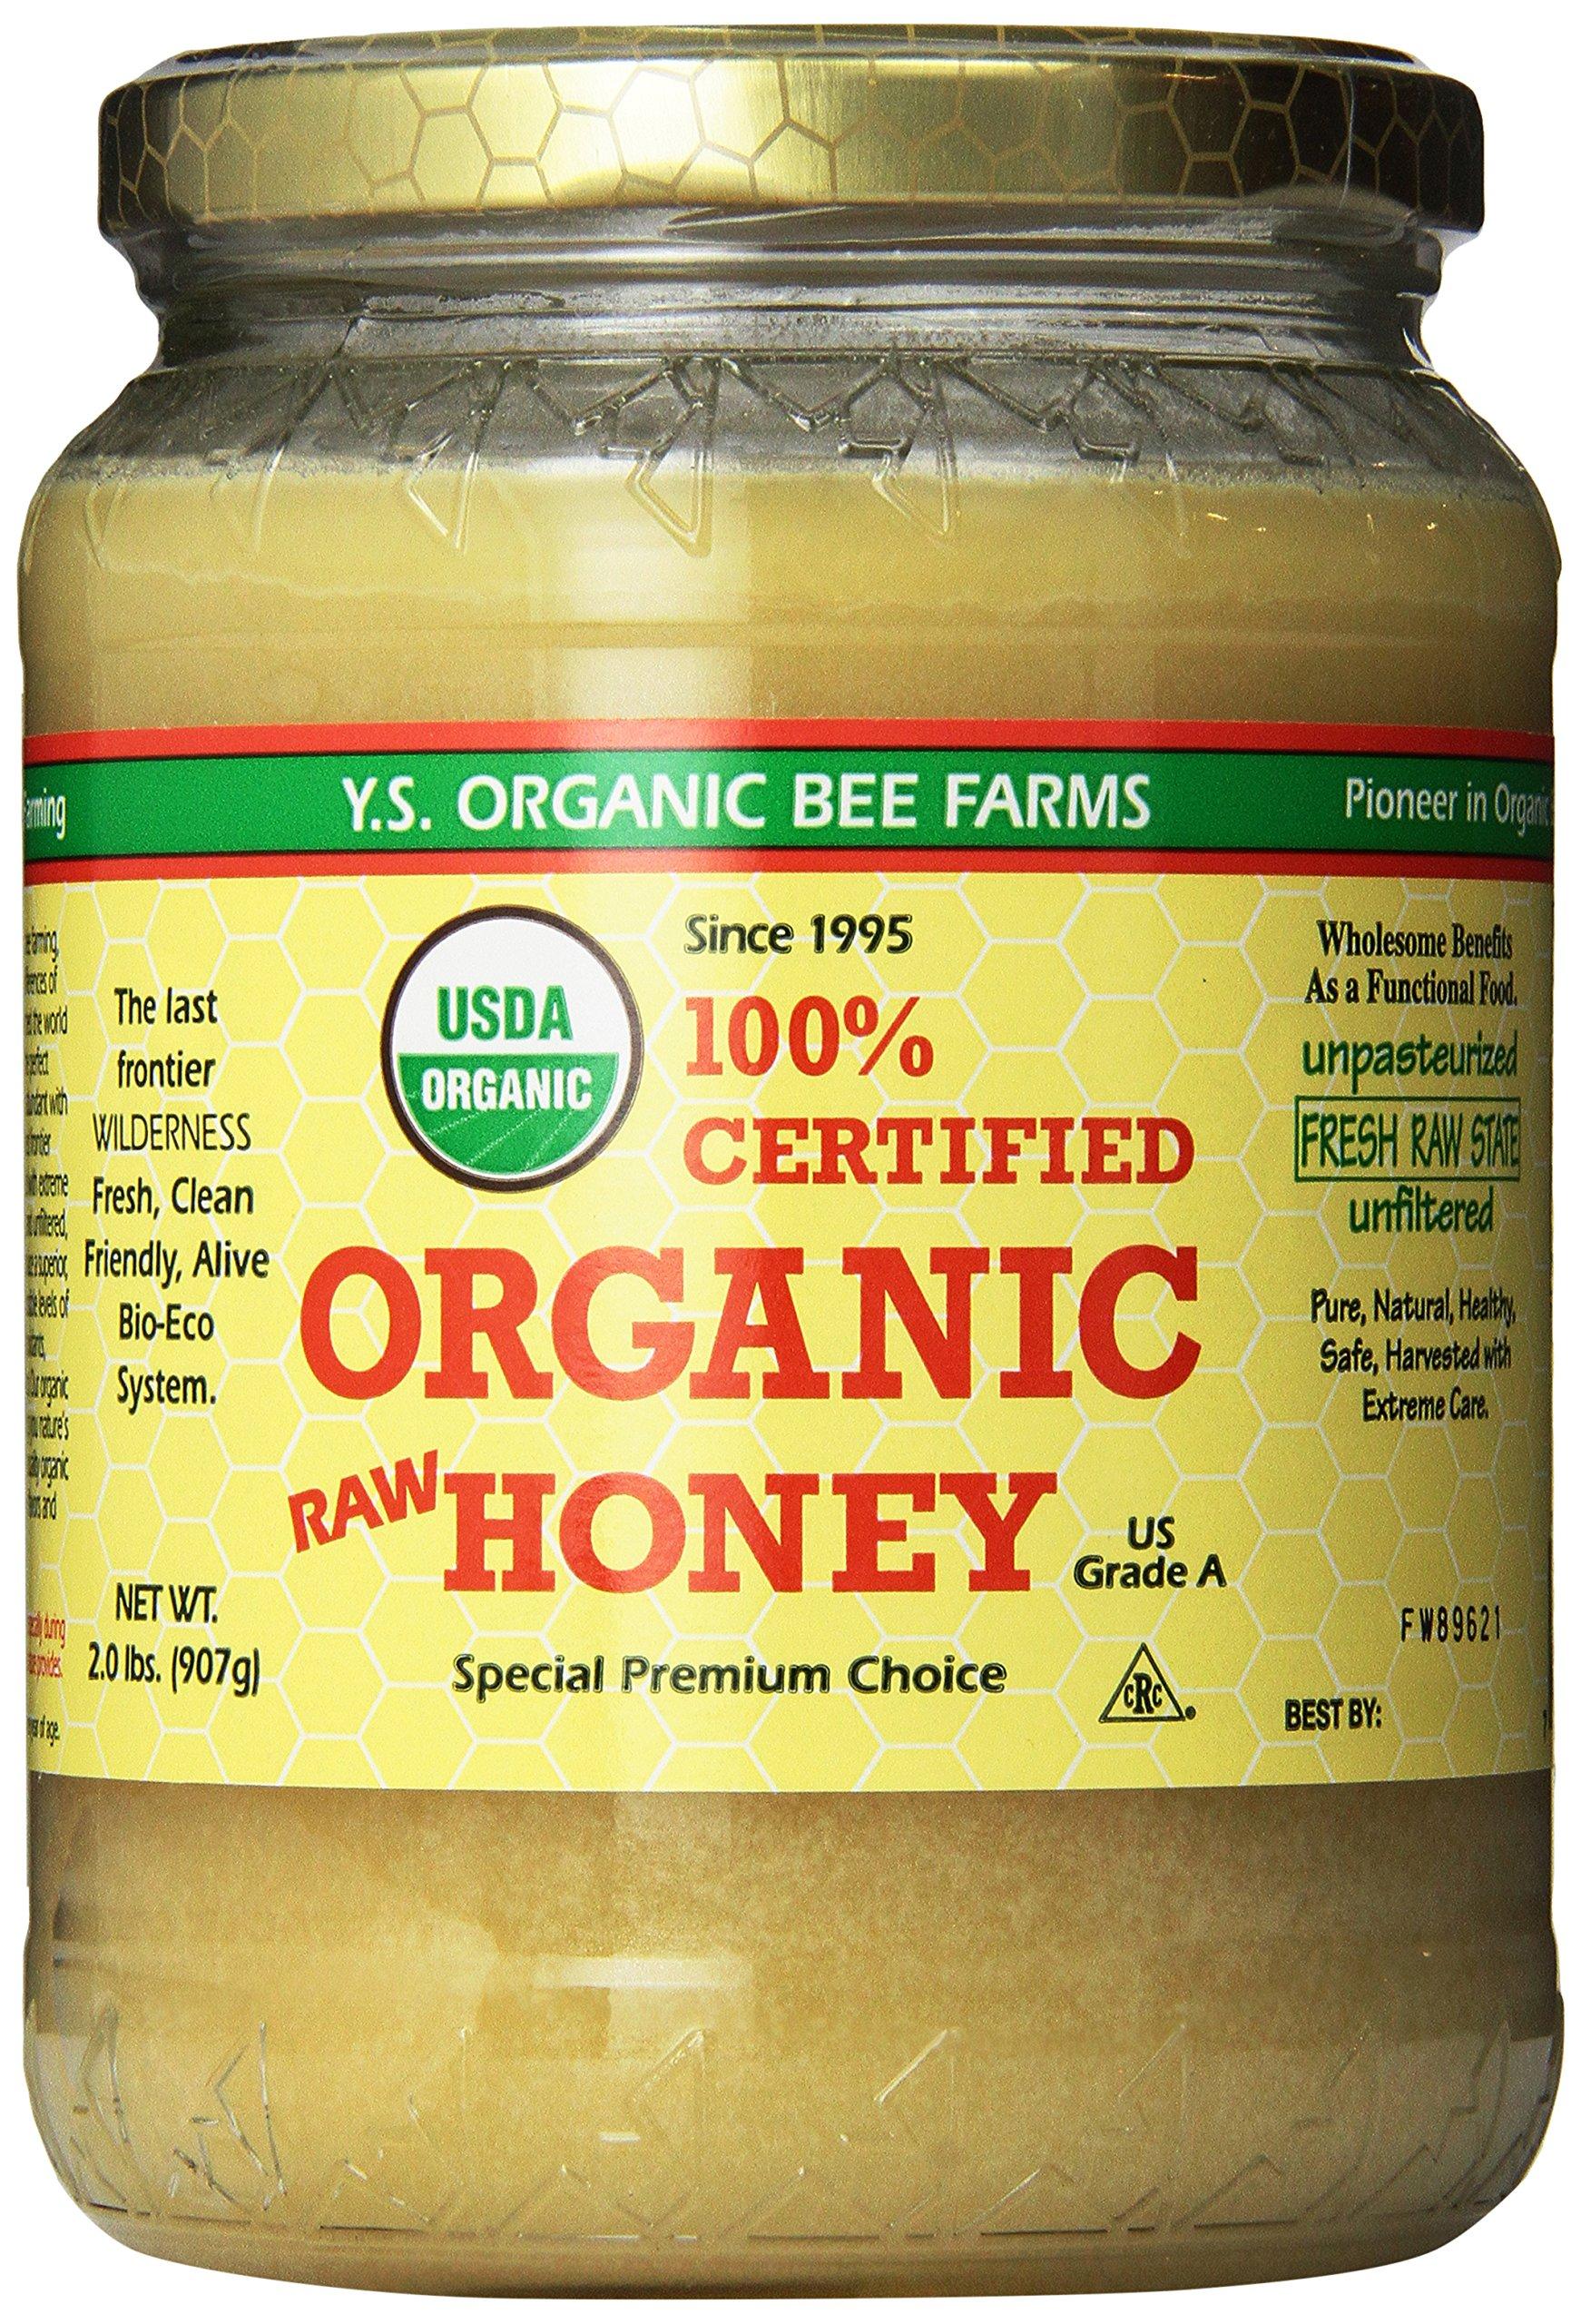 YS Organic Bee Farms Certified Organic Raw Honey 100% Unprocessed, Unpasteurized - Kosher 32oz 2 Lbs